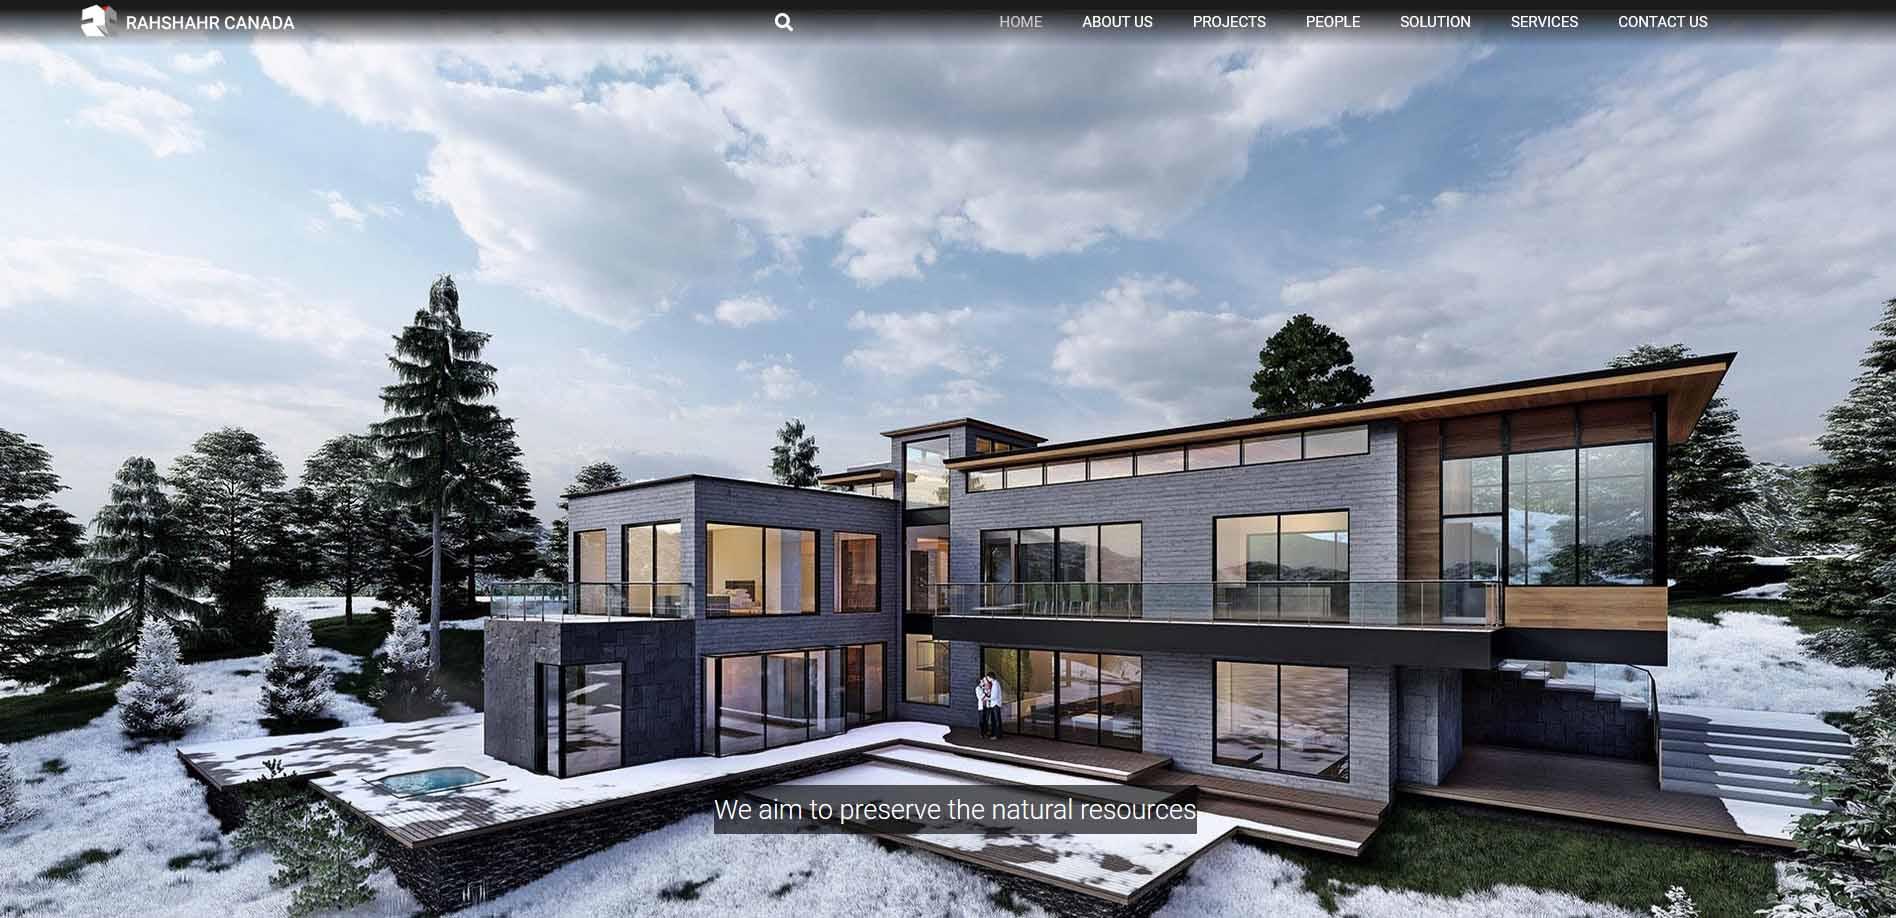 rahshahr - طراحی سایت